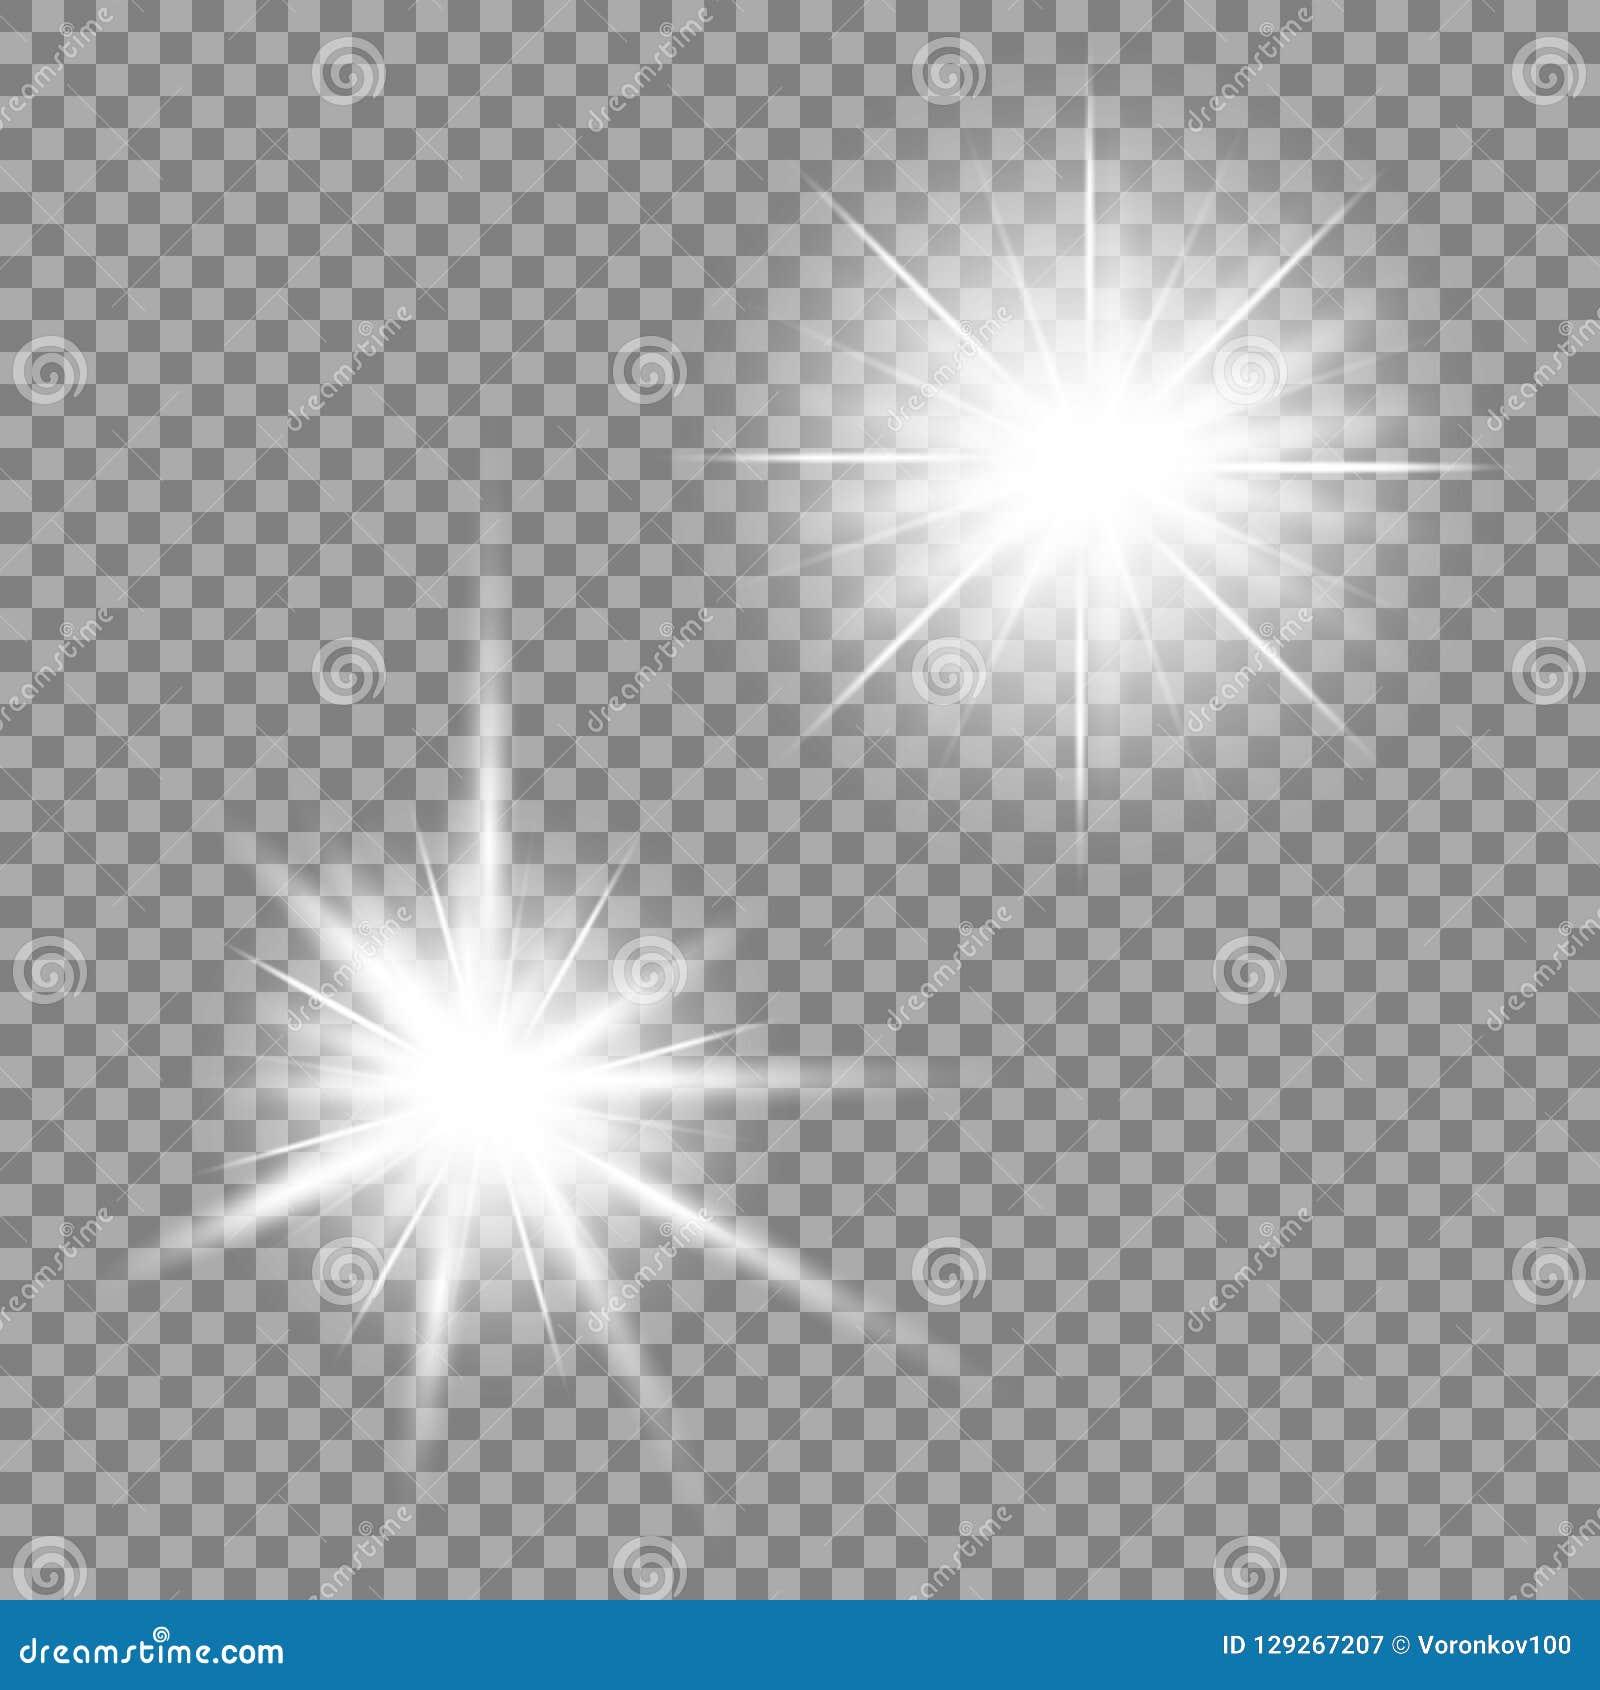 Bright light glare on a transparent background. Vector illustration for your design.